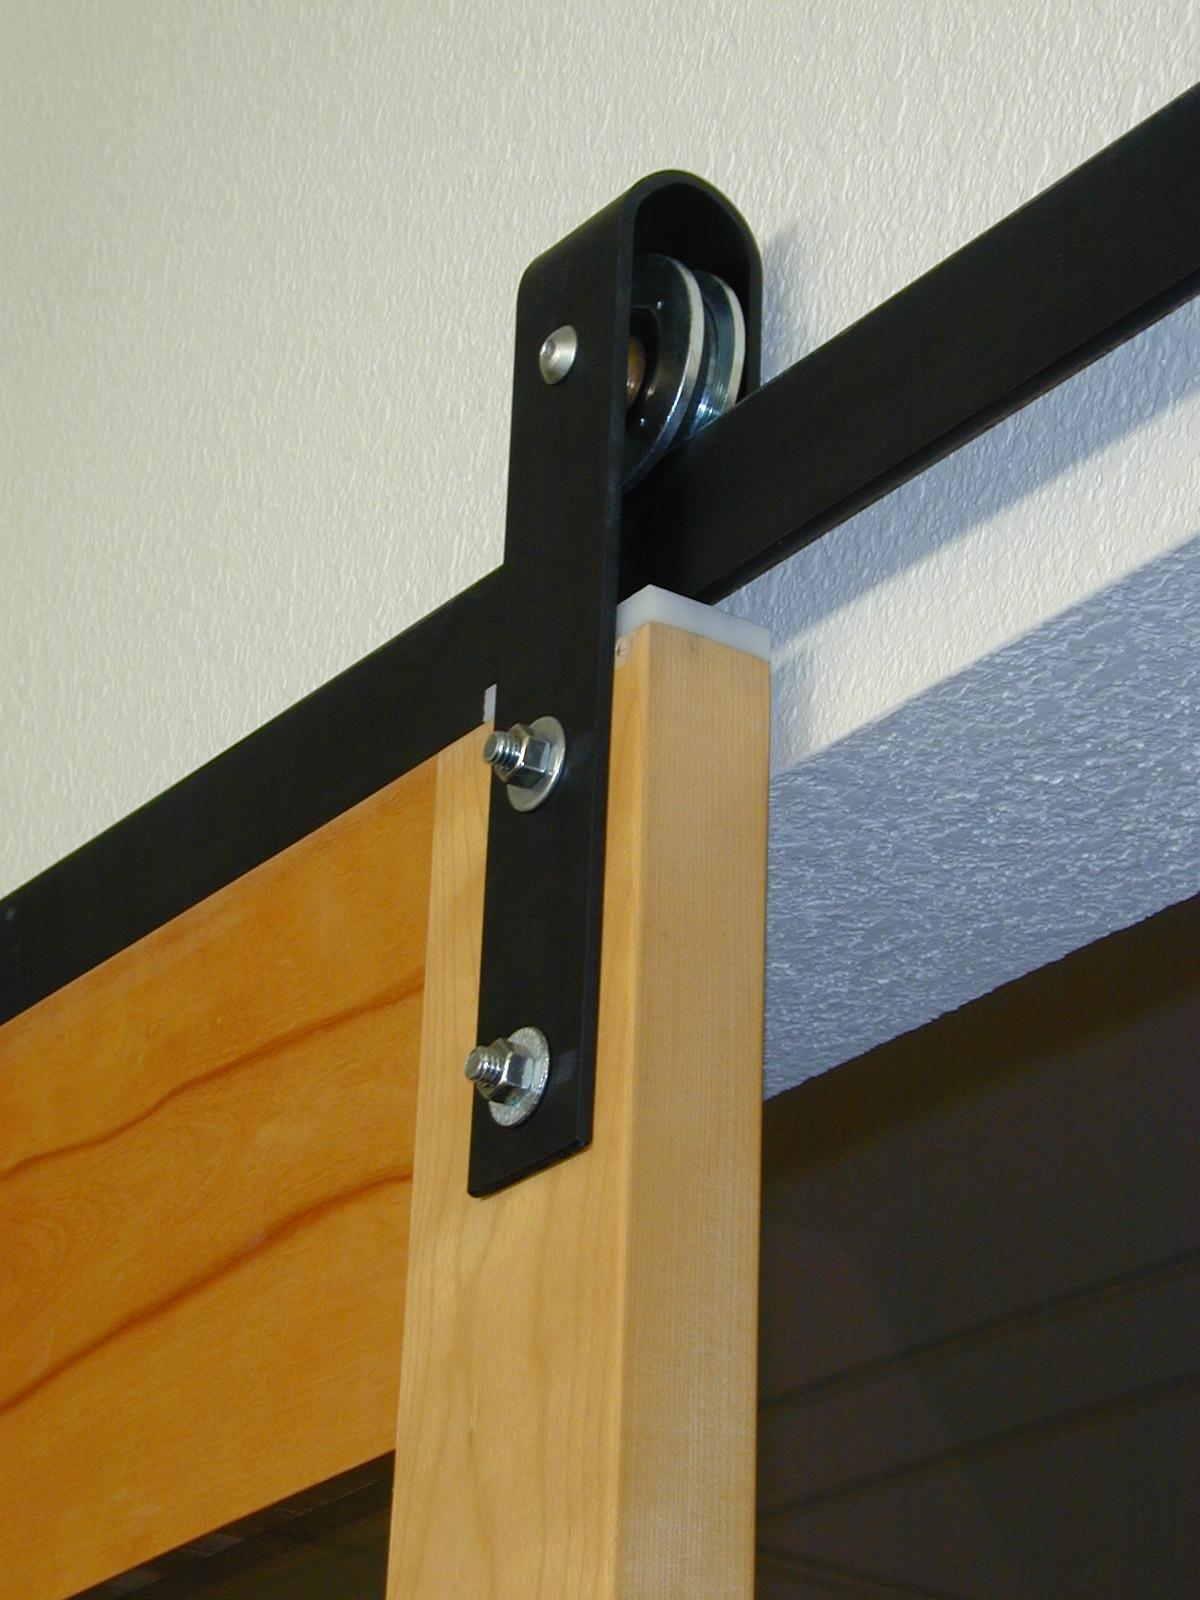 Shed Sliding Door Tracks Clingerman Doors - Custom Wood Garage Doors - Clearville, PA